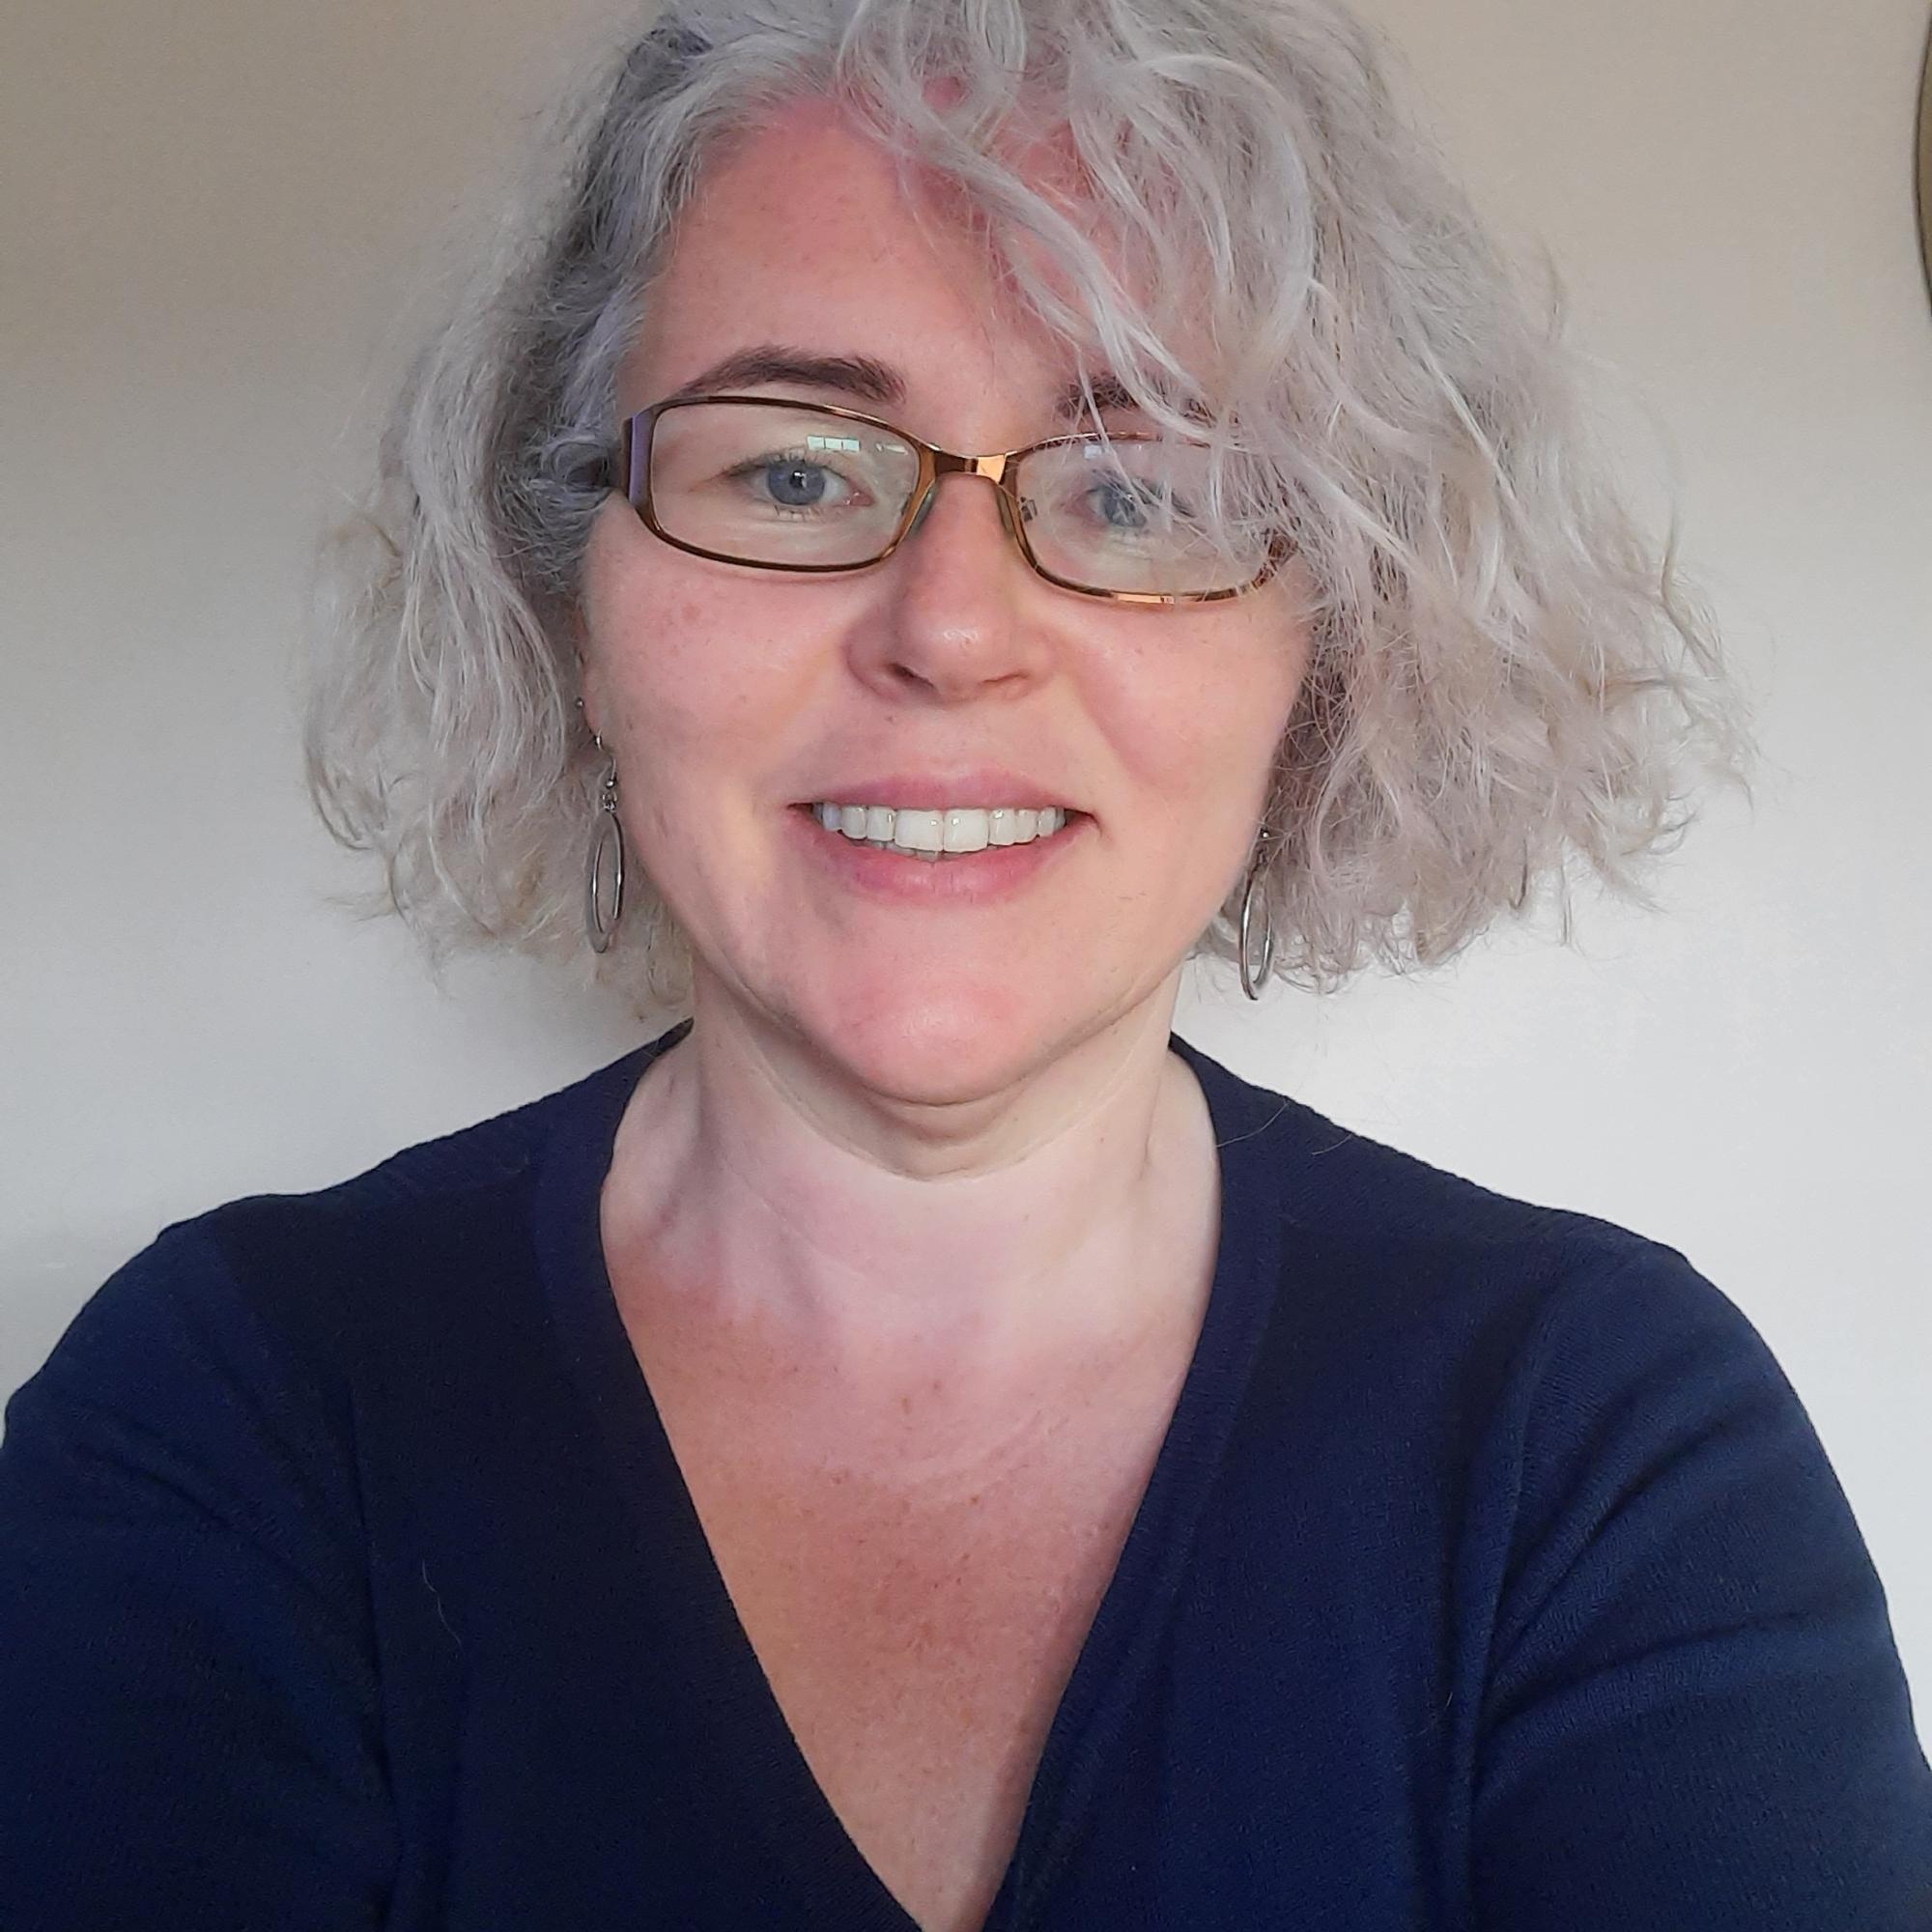 Elaine Grehan, IDS representative